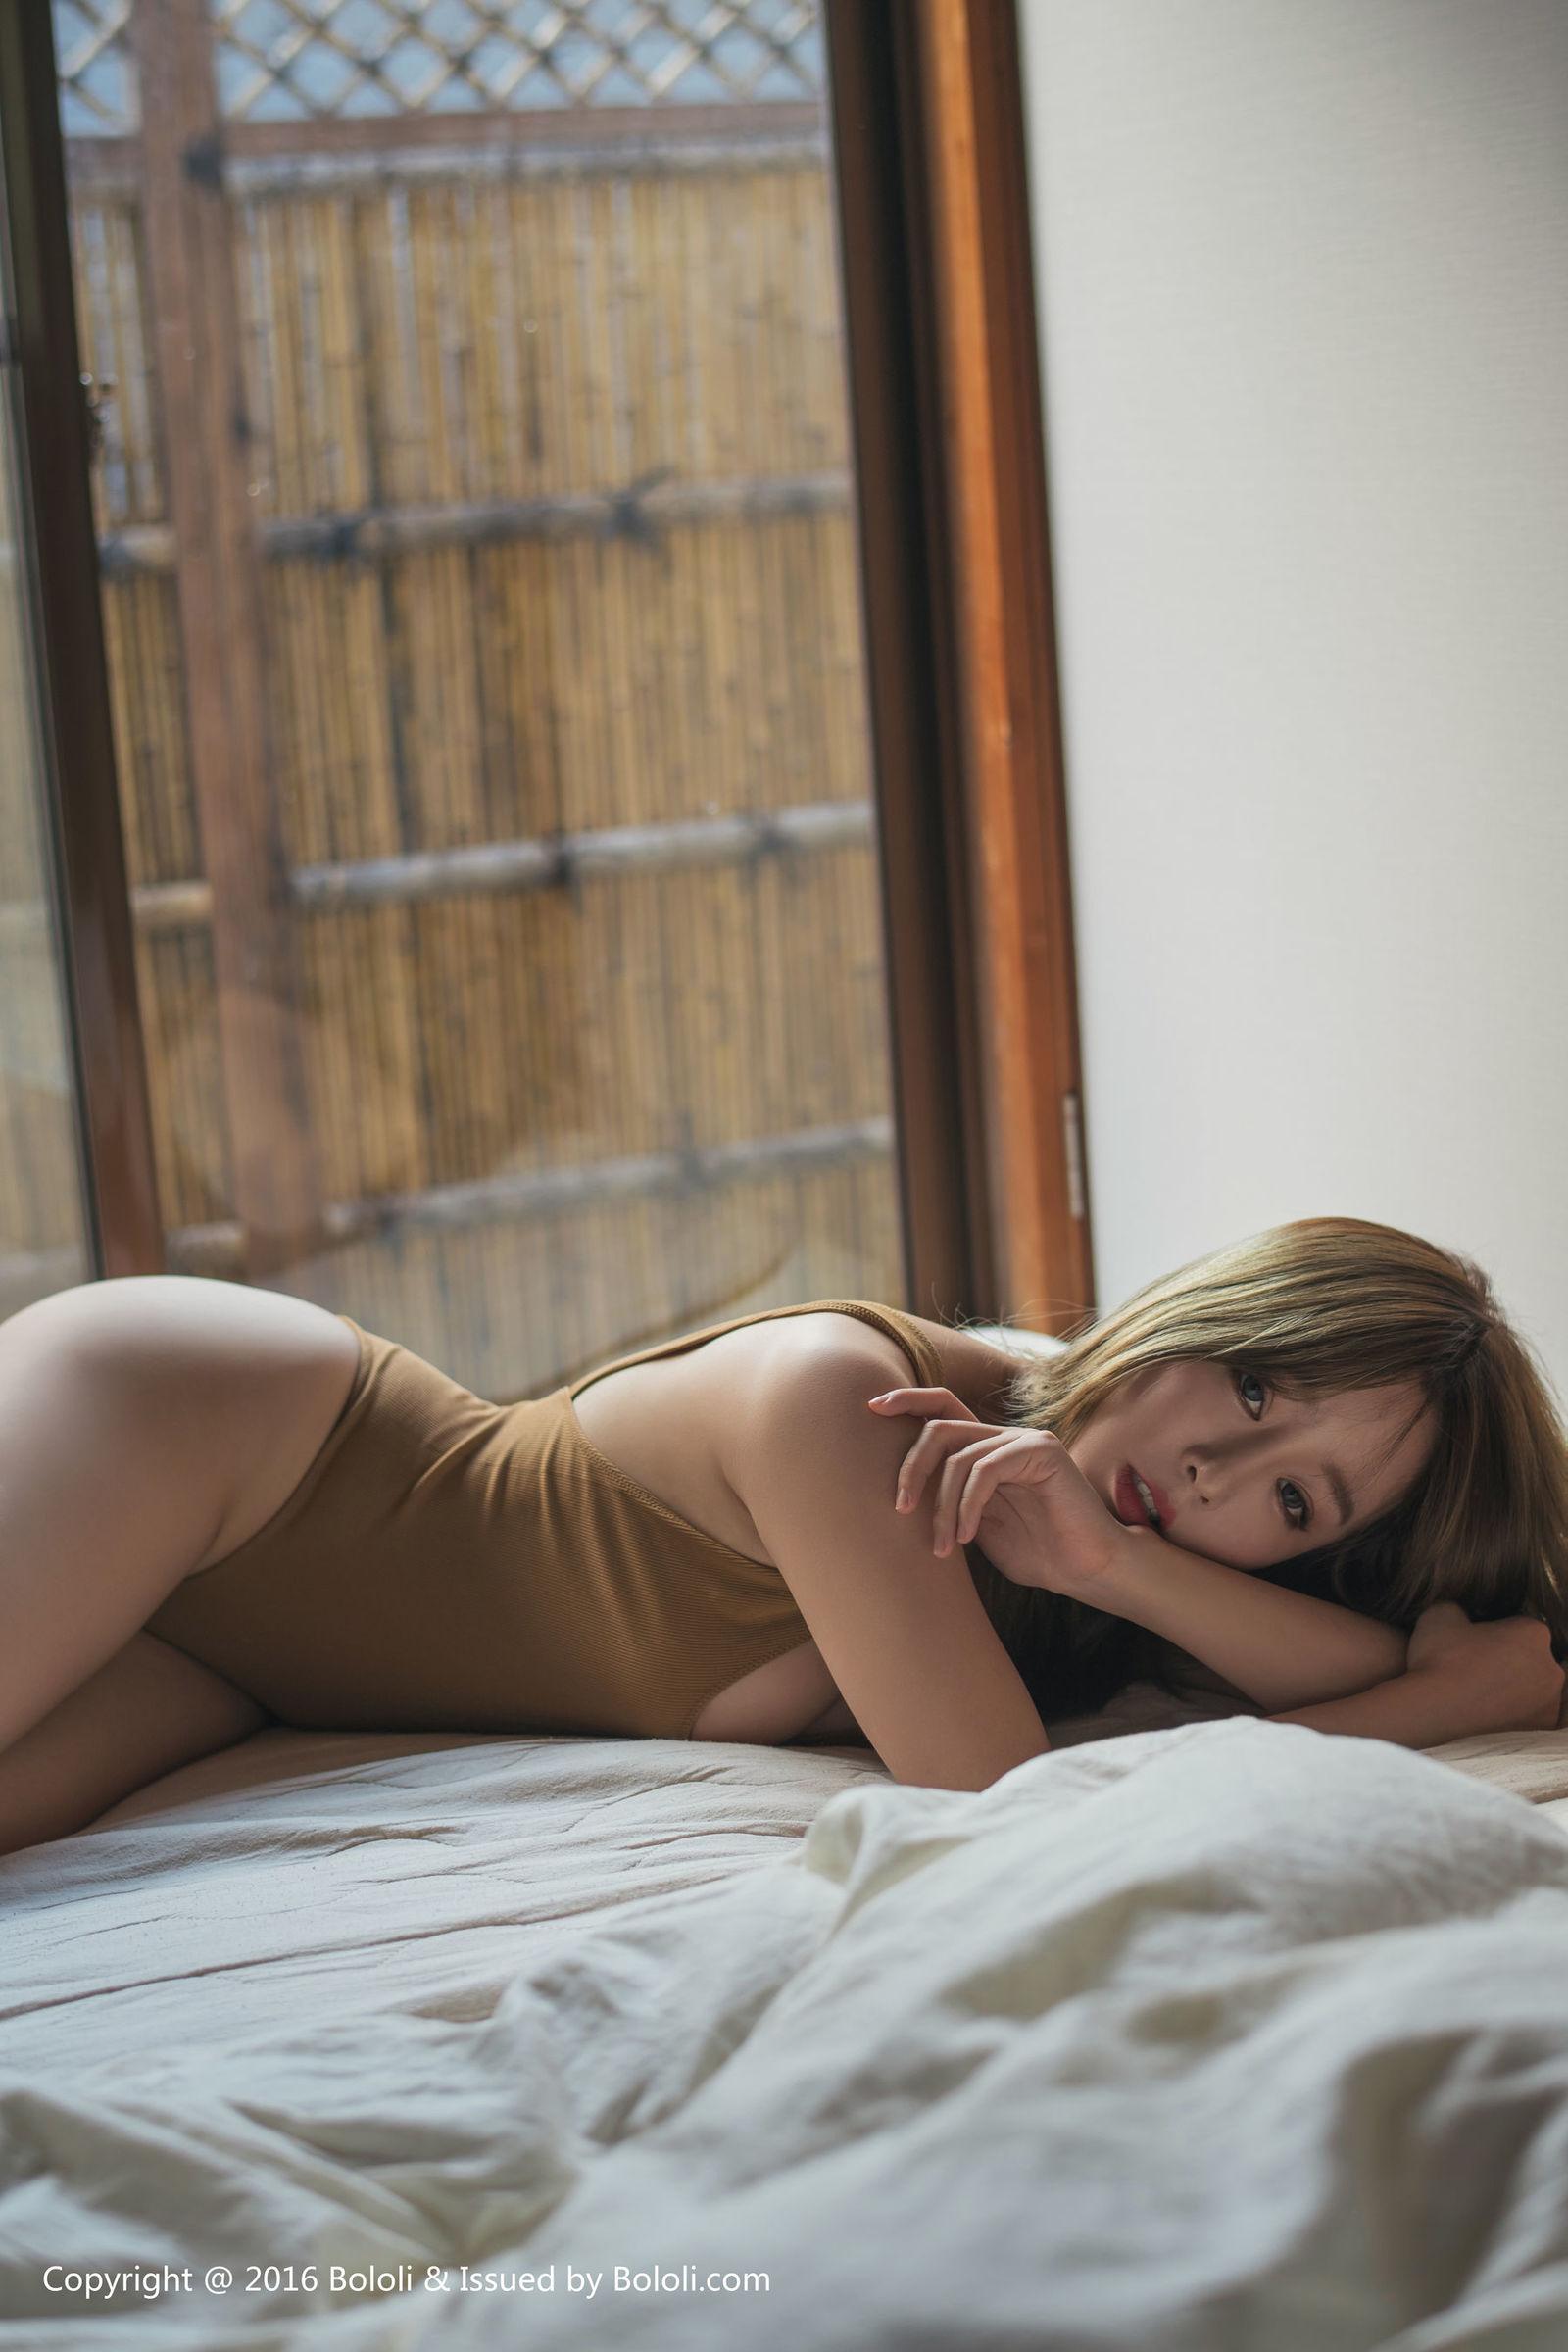 [Bololi波萝社] BOL.086 王雨纯 - 诱惑の红唇 丝袜美图[54P]